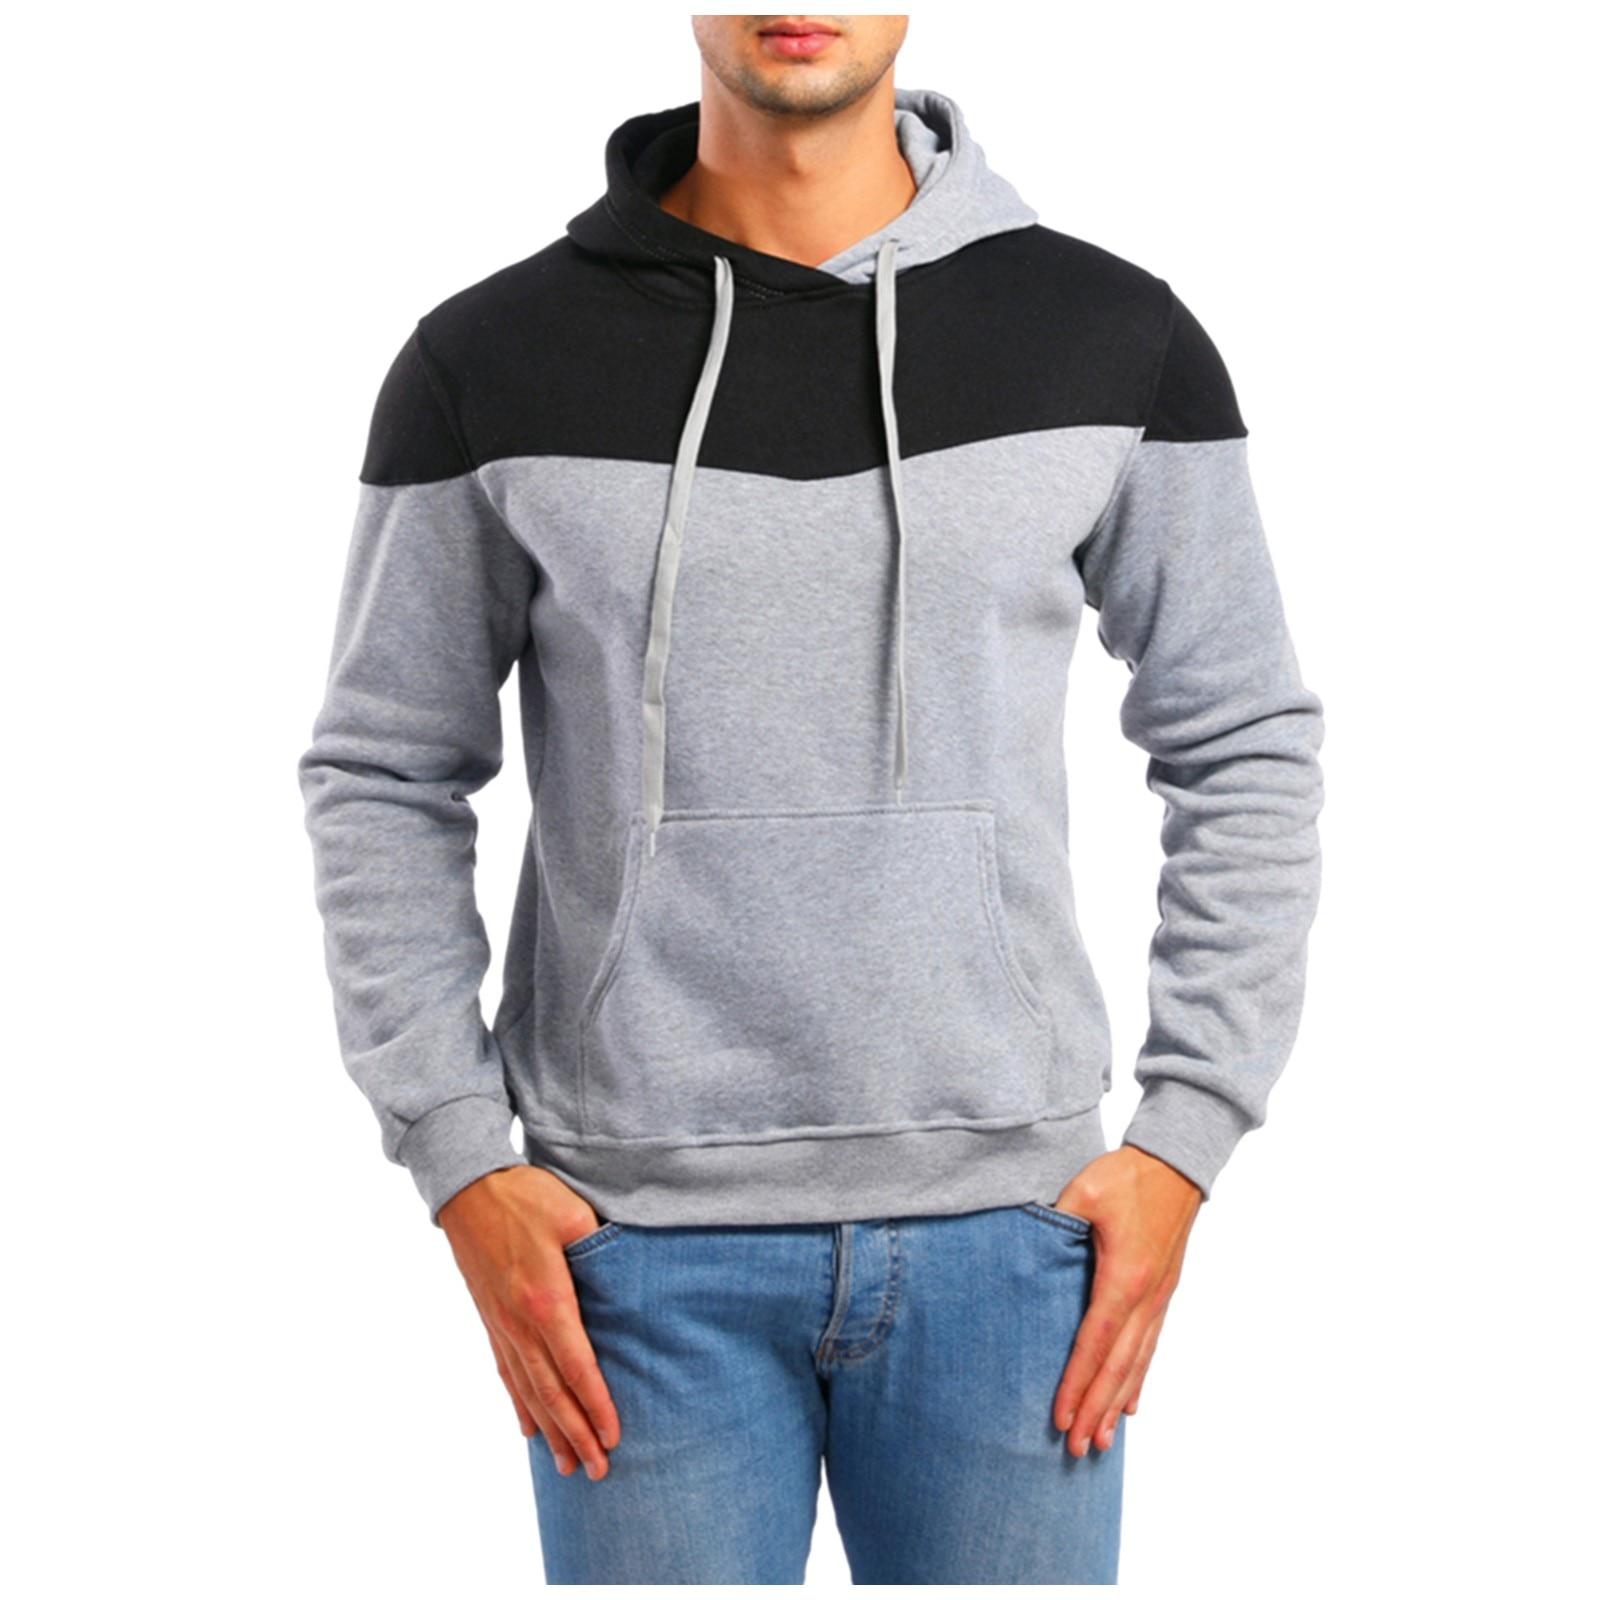 color block chest pocket dip hem tee Men's Casual Color Block Top Men's Hooded Pullover Sweatshirt With Pocket